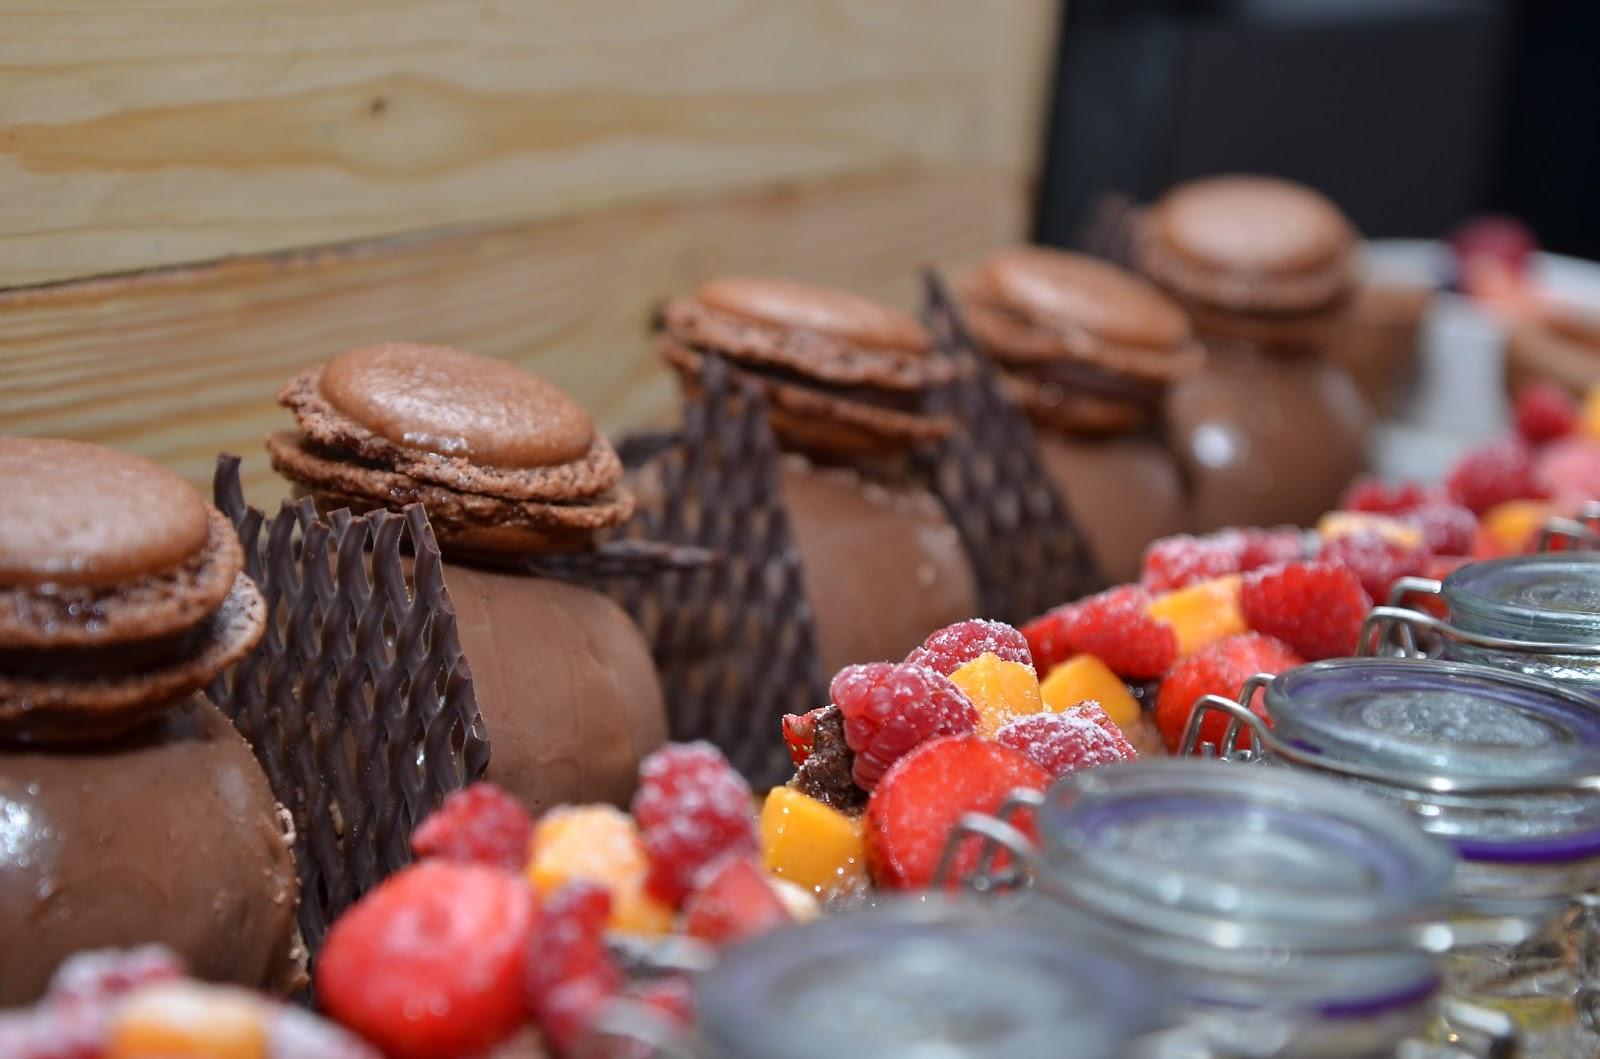 Dusit D2, chocolates, chocolatefestival, Stylewithezil